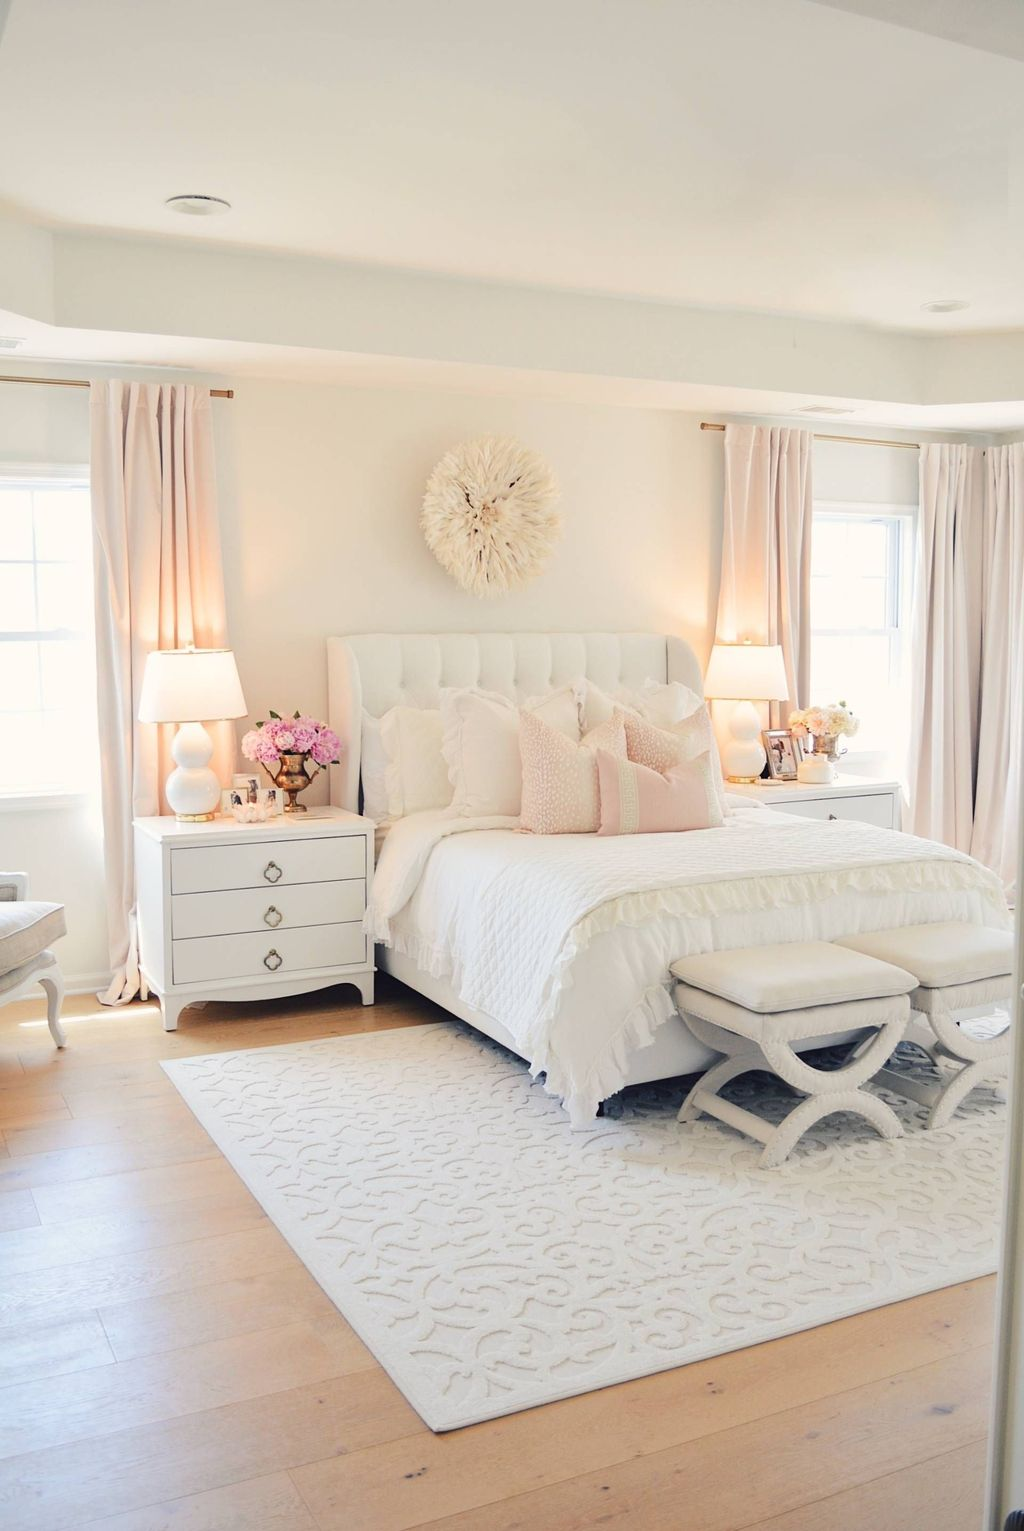 Lovely Spring Bedroom Decor Ideas Trending This Year 12